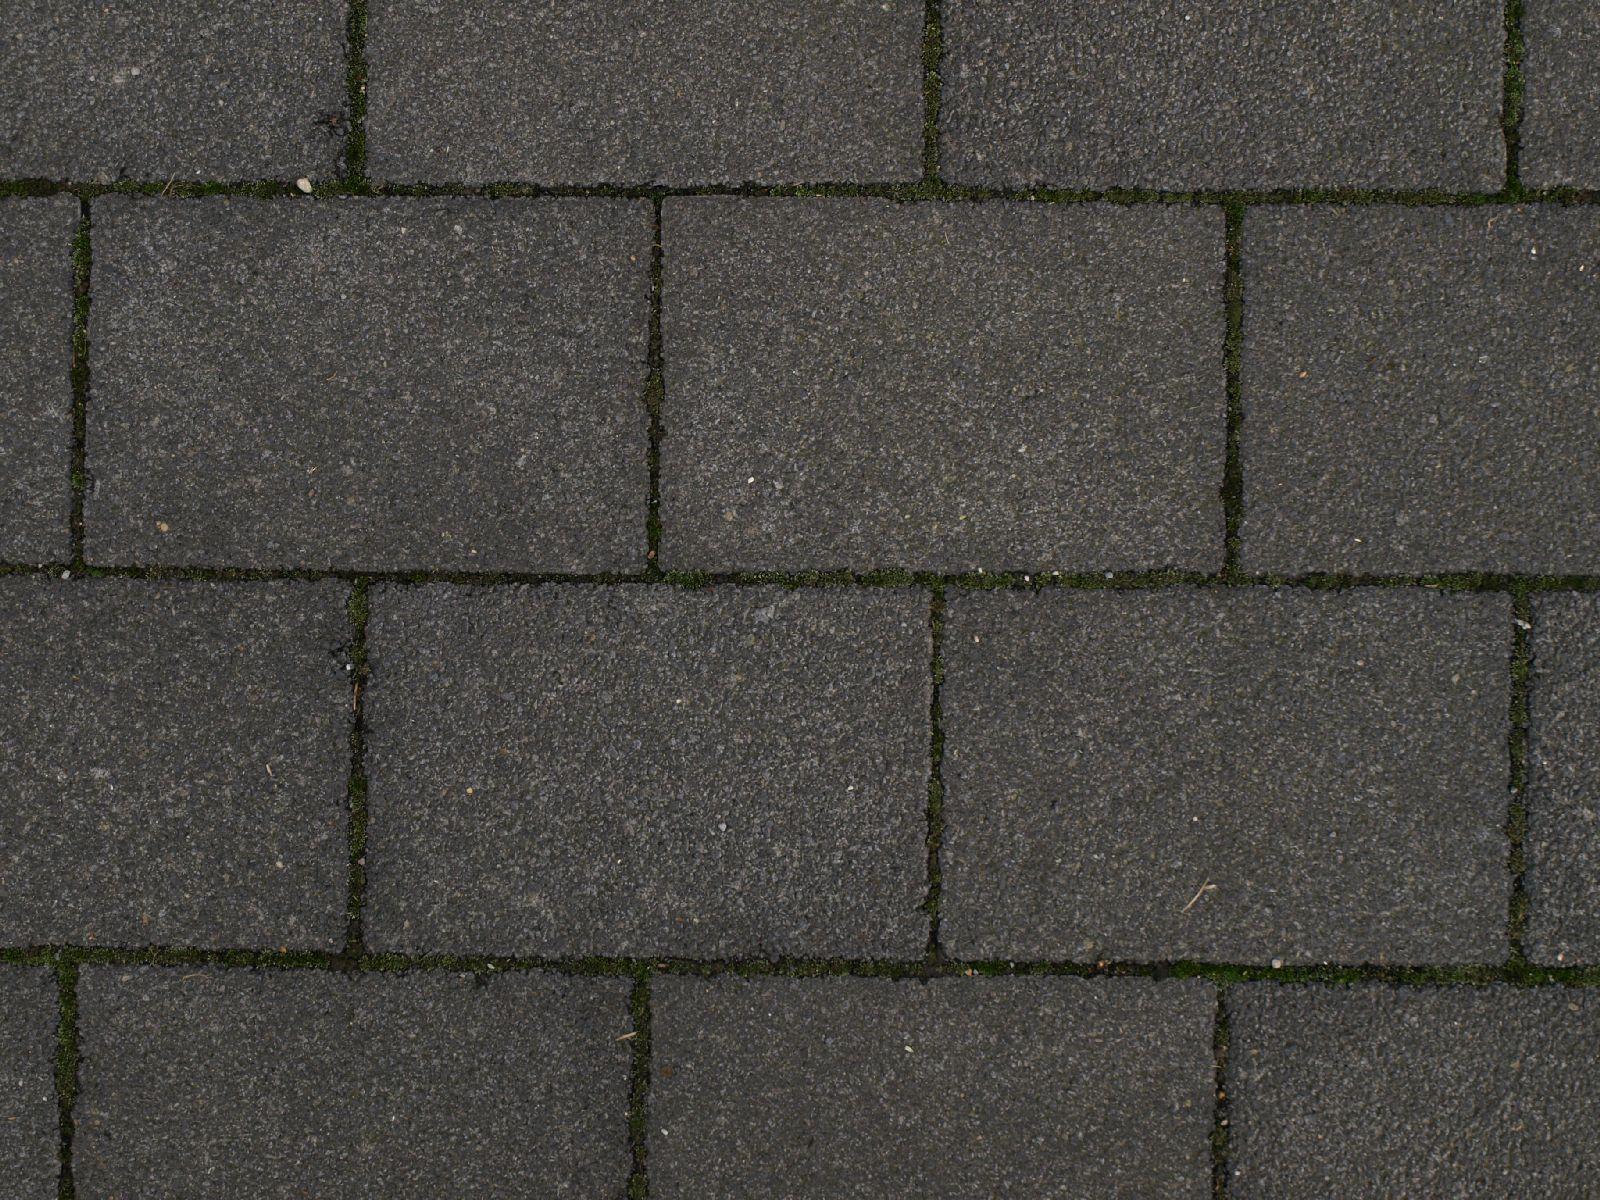 Ground-Urban_Texture_A_PA045771